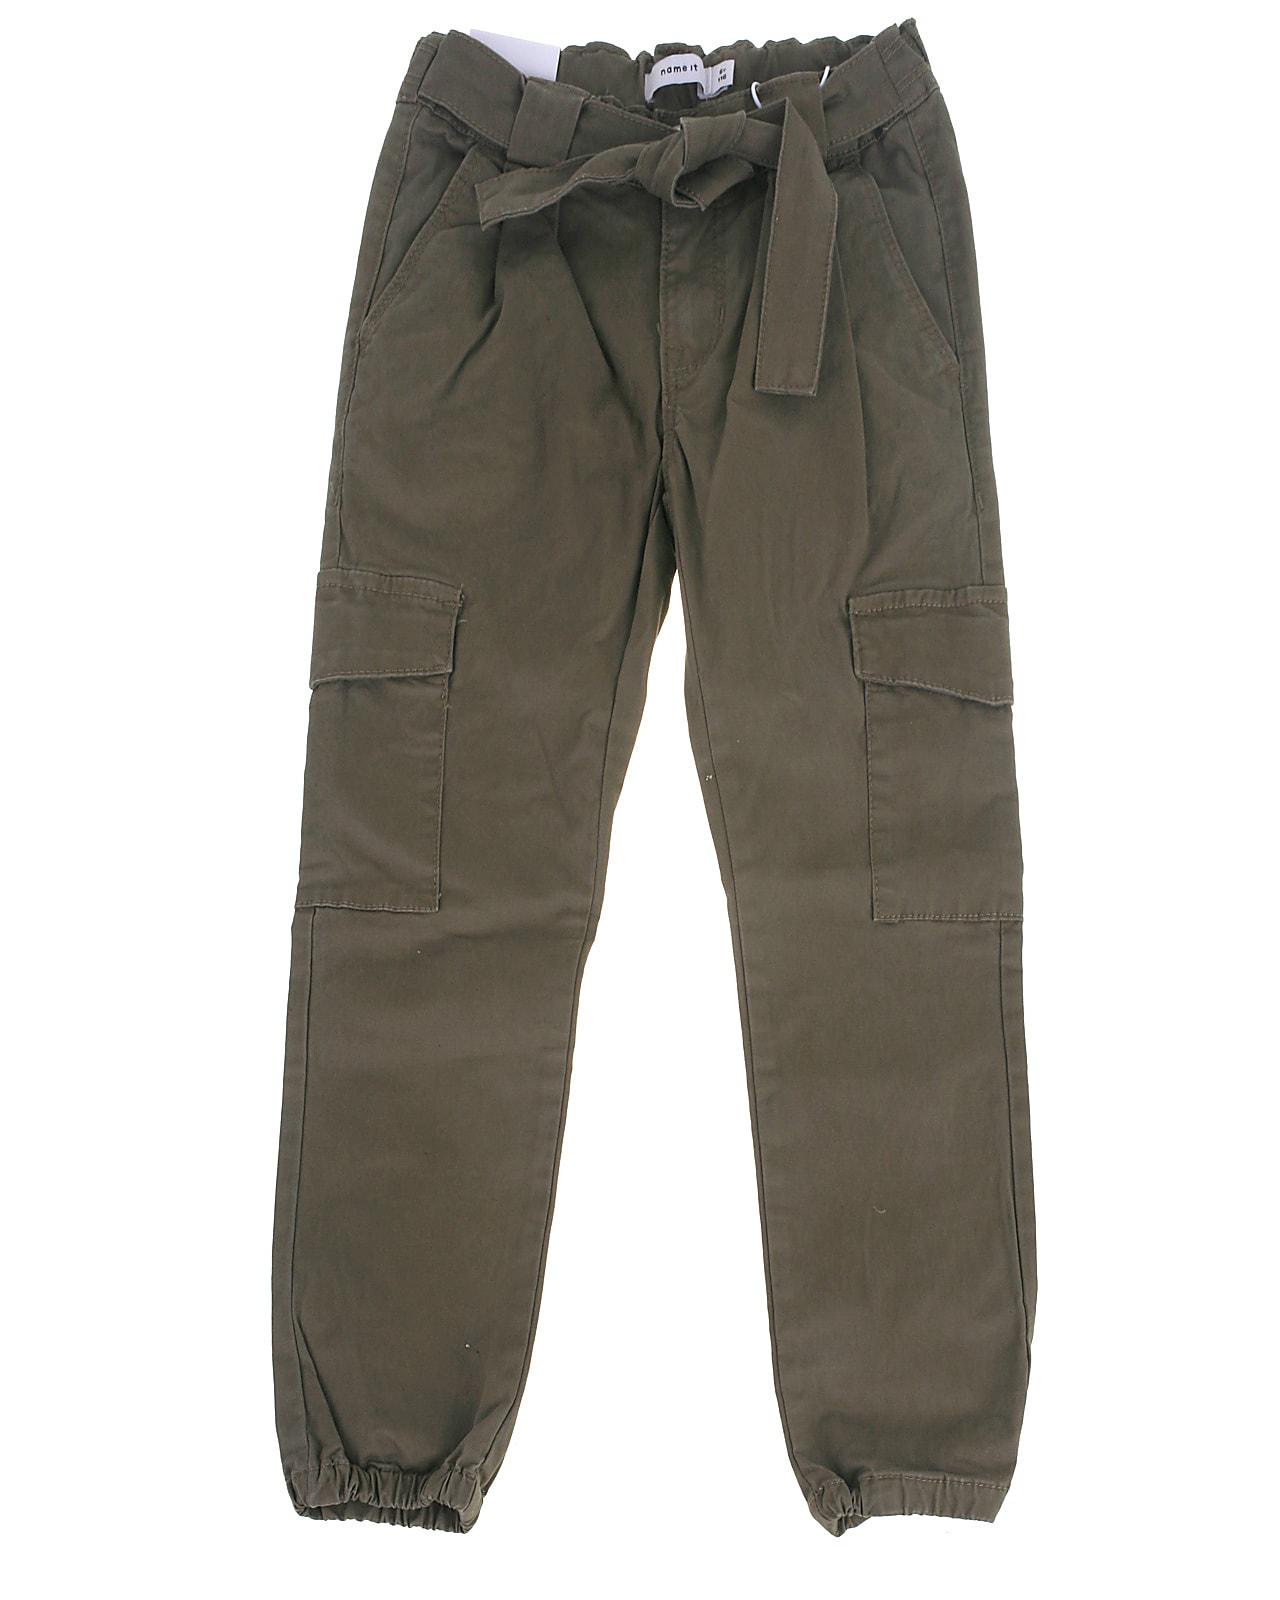 Image of Name It cargo pants, Sea, stonegray